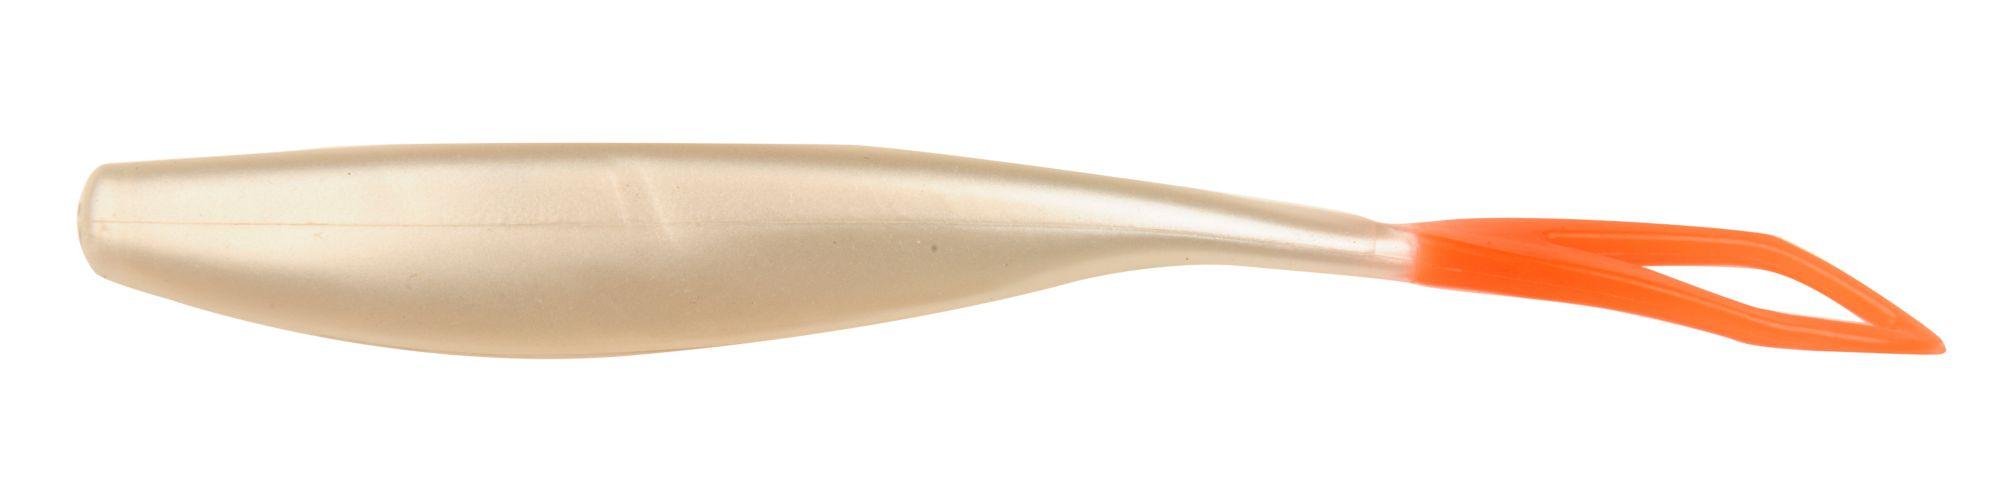 D.O.A. C.A.L. Jerk Soft Baits, 5 1/2 IN., Pearl/fire Tail